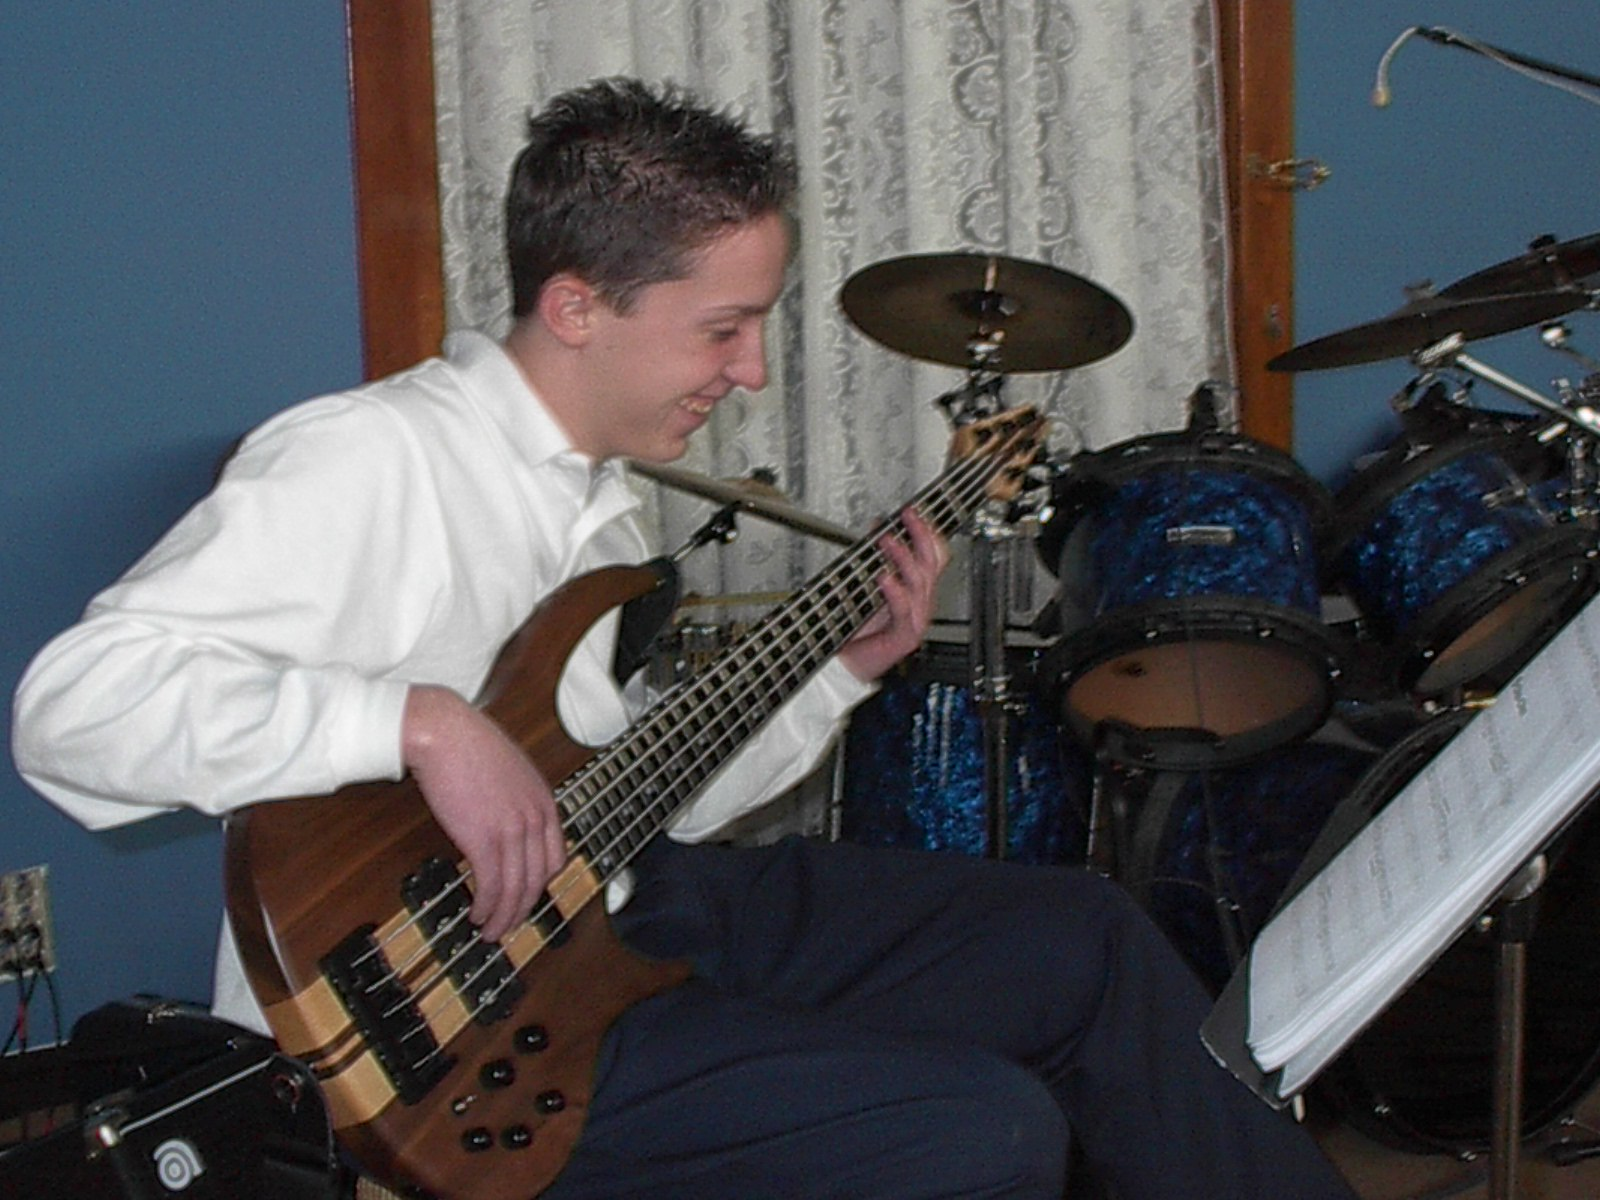 Intermediate/Advanced Bass student